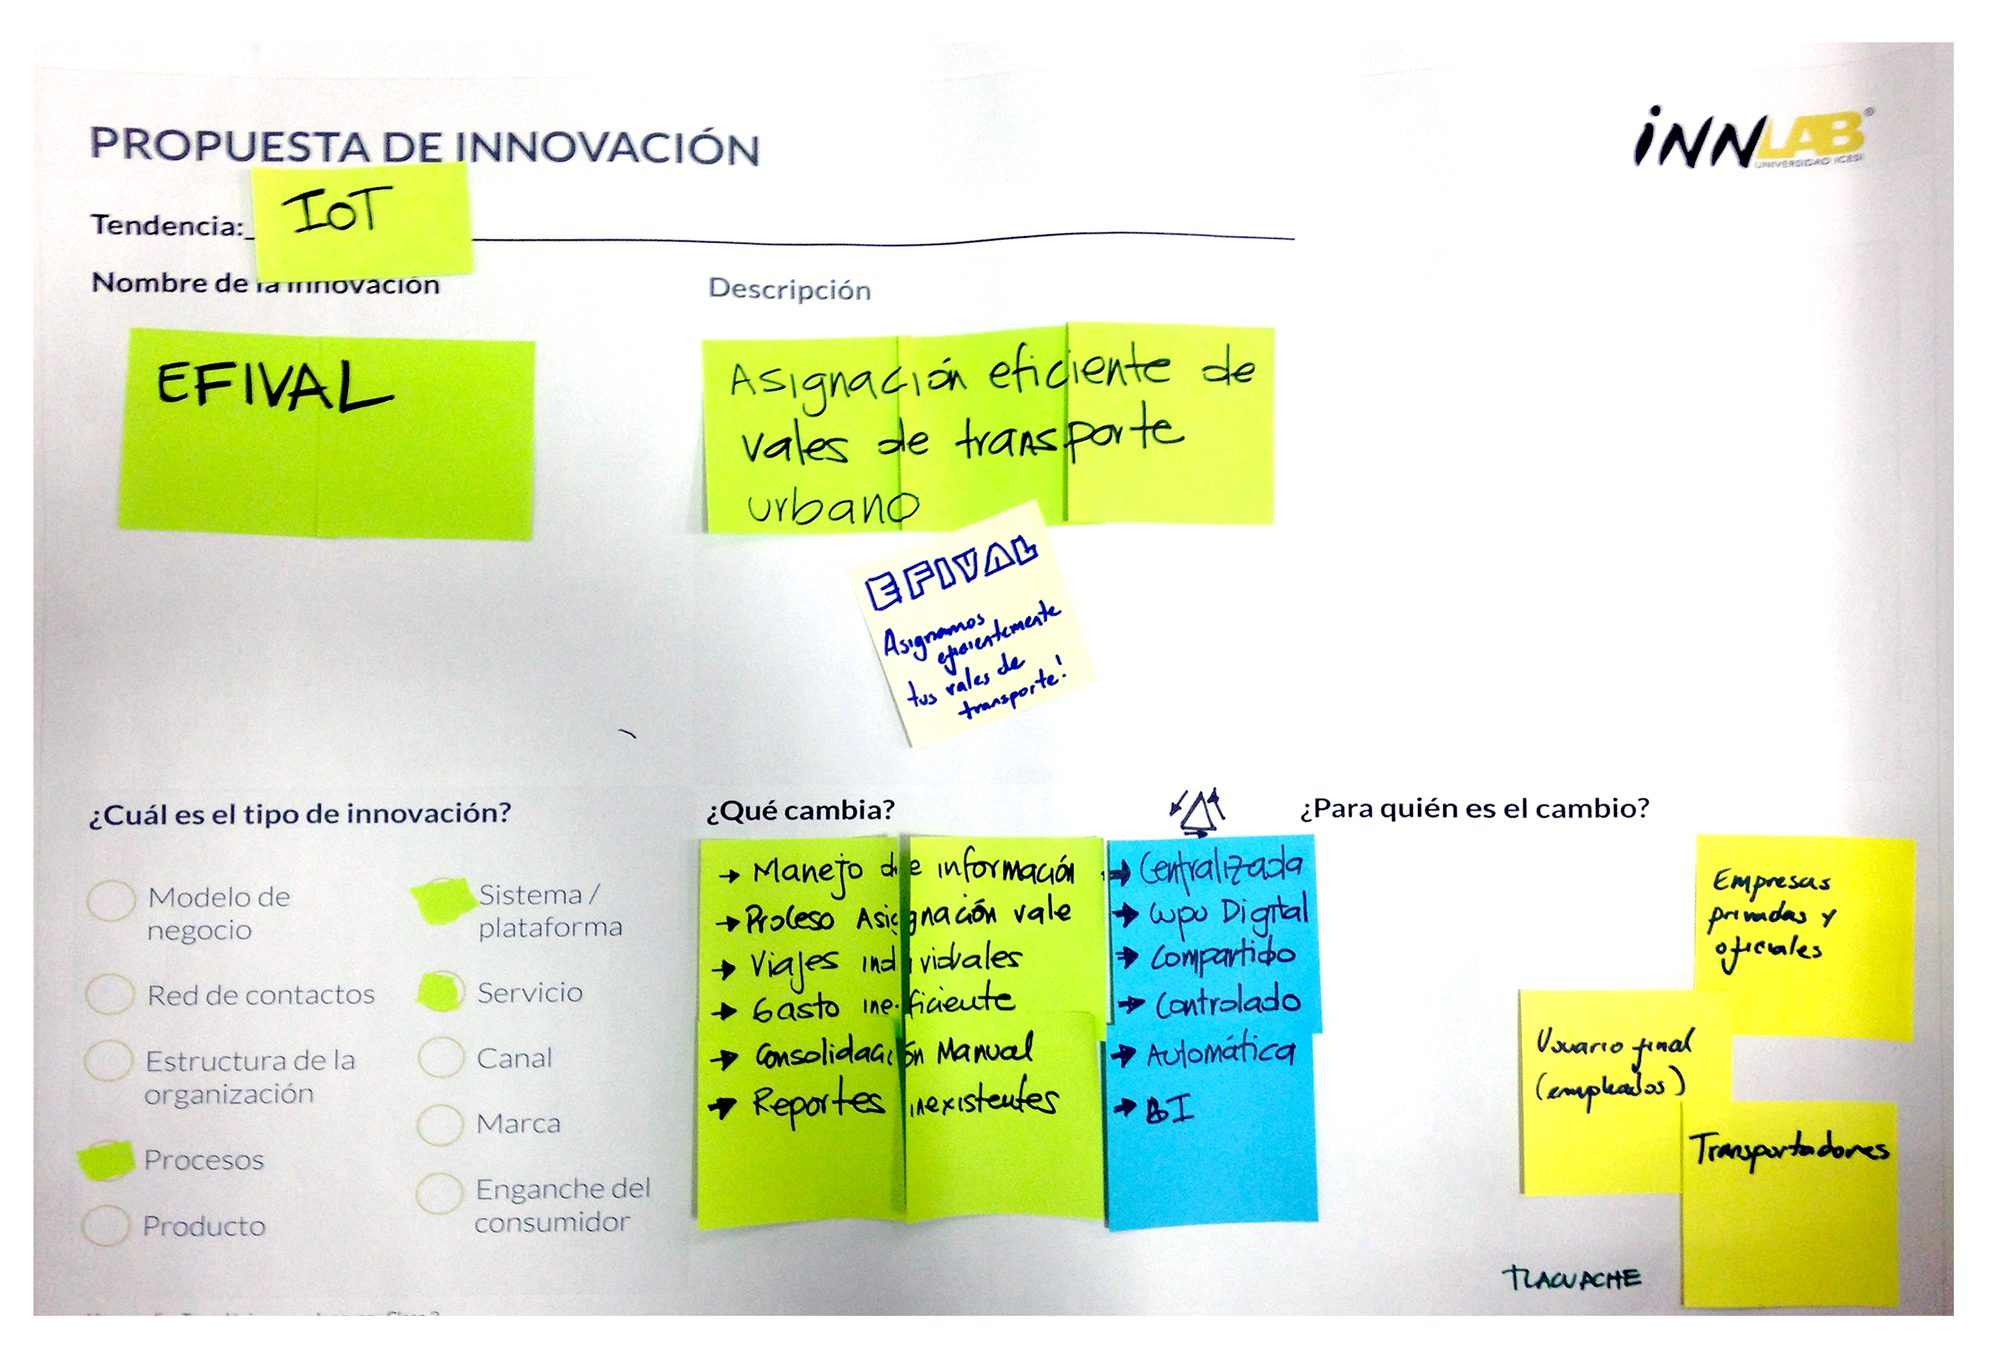 efival-innovation-proposal